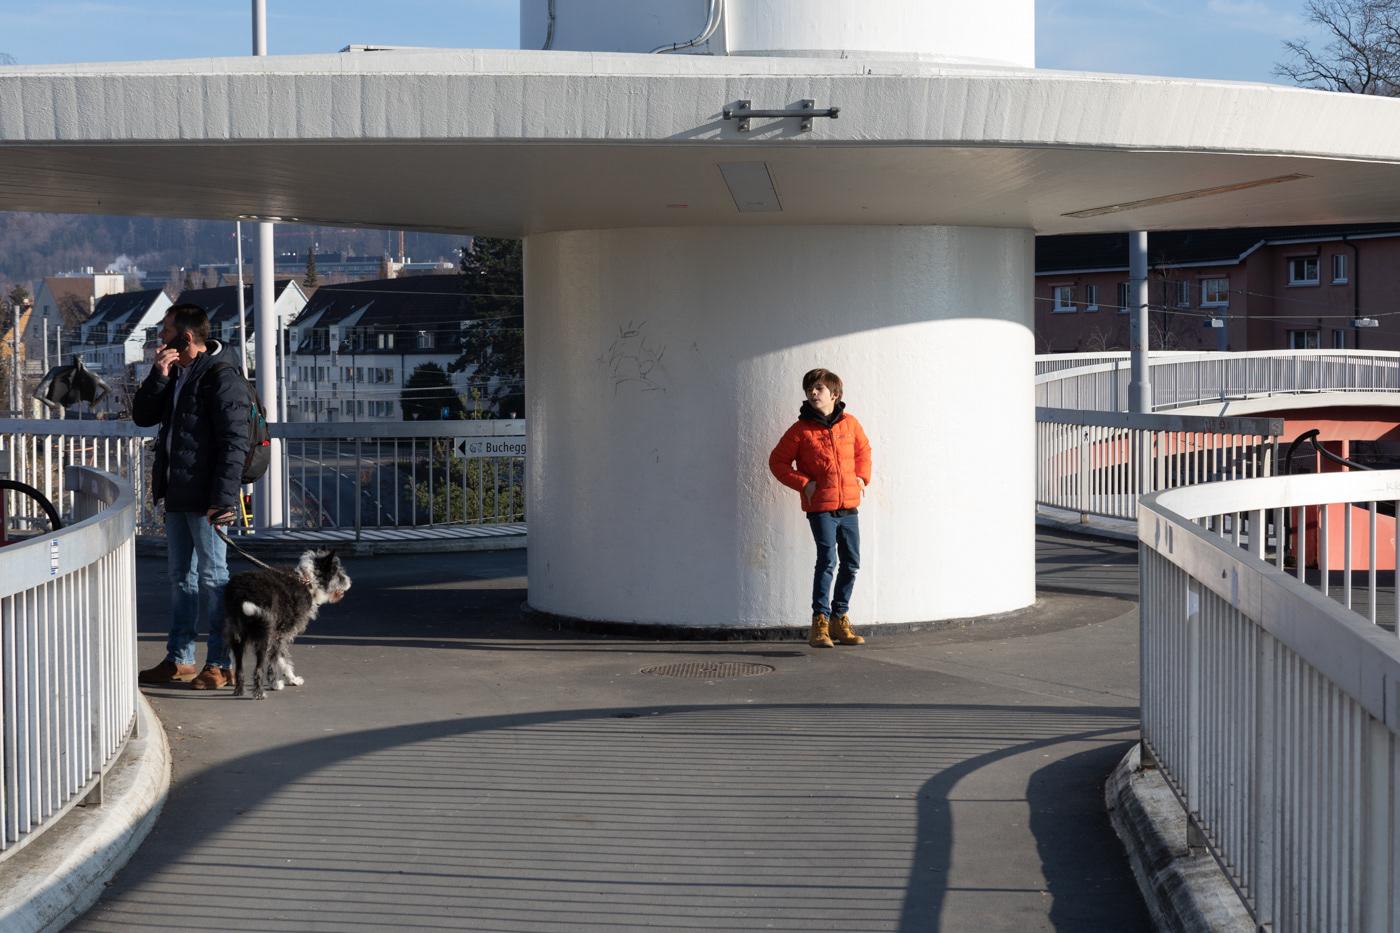 Zurich Switzerland turism outskirts Landscape Urban Urban Design borders street photography Photography